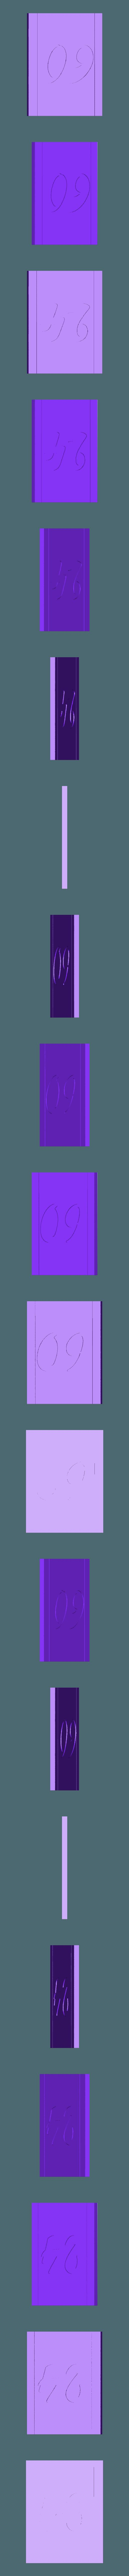 9_-_24.stl Download free SCAD file Perpetual Flip Calendar (W/ Customizable Font) • 3D printable model, Dsk